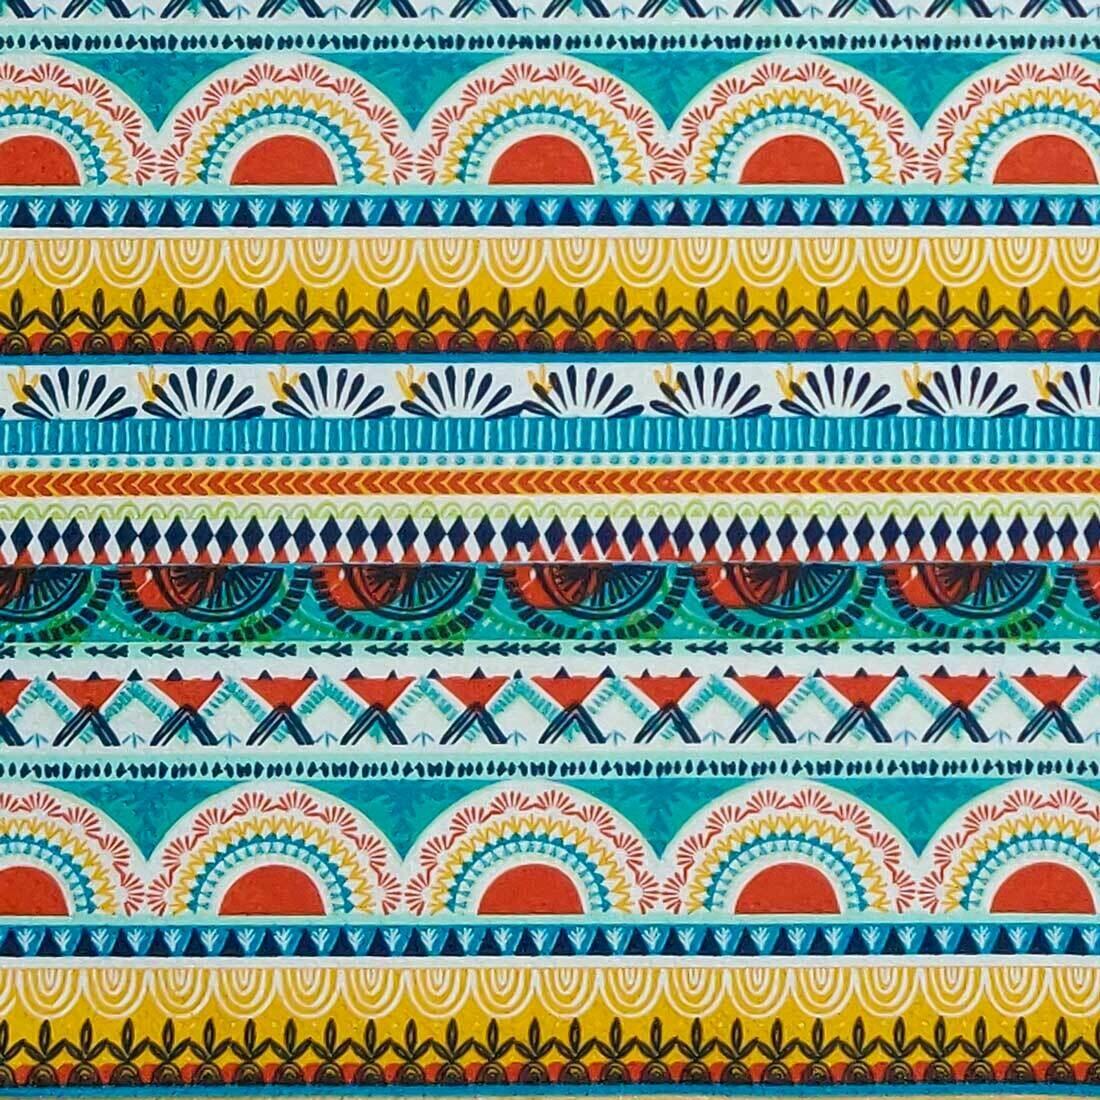 Decoupage Paper Napkins - Manda Terracota (1 Sheet)